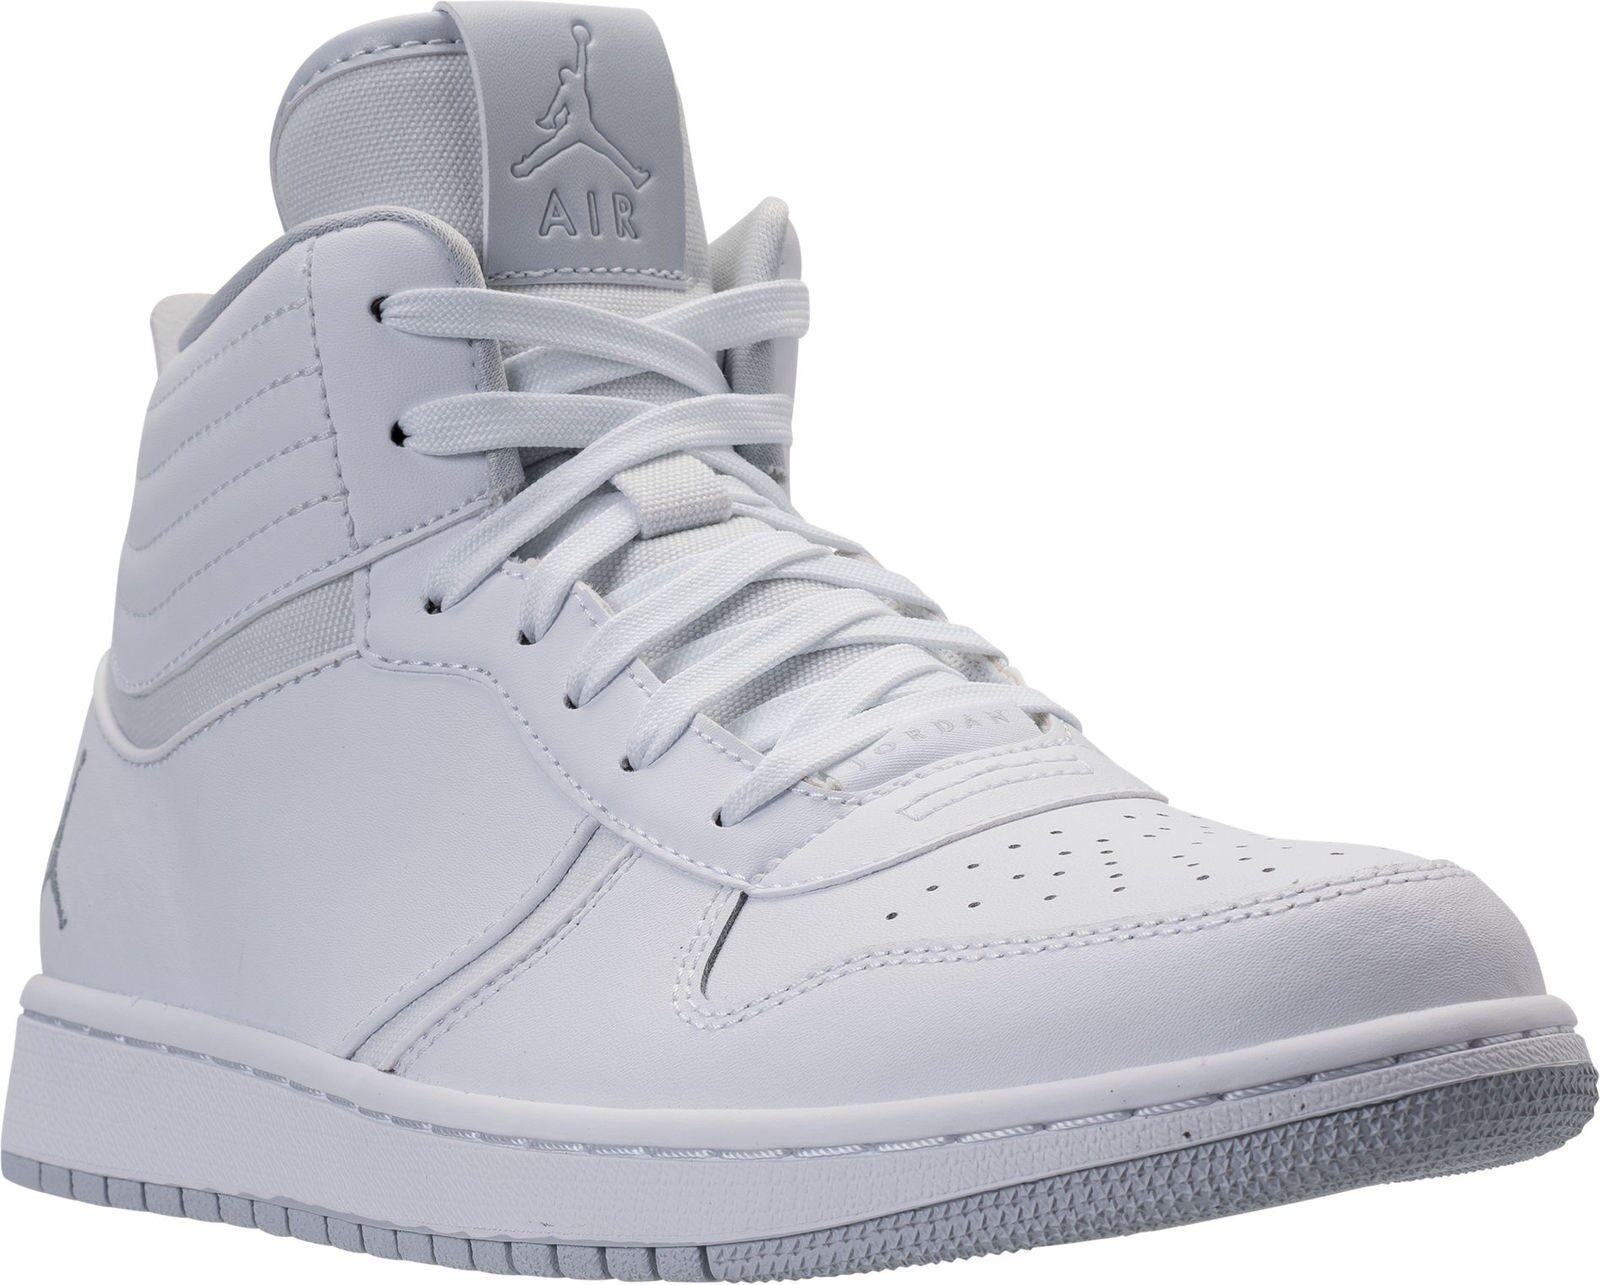 Mens Air Jordan Heritage Basketball shoes White 886312 100 Size 11.5